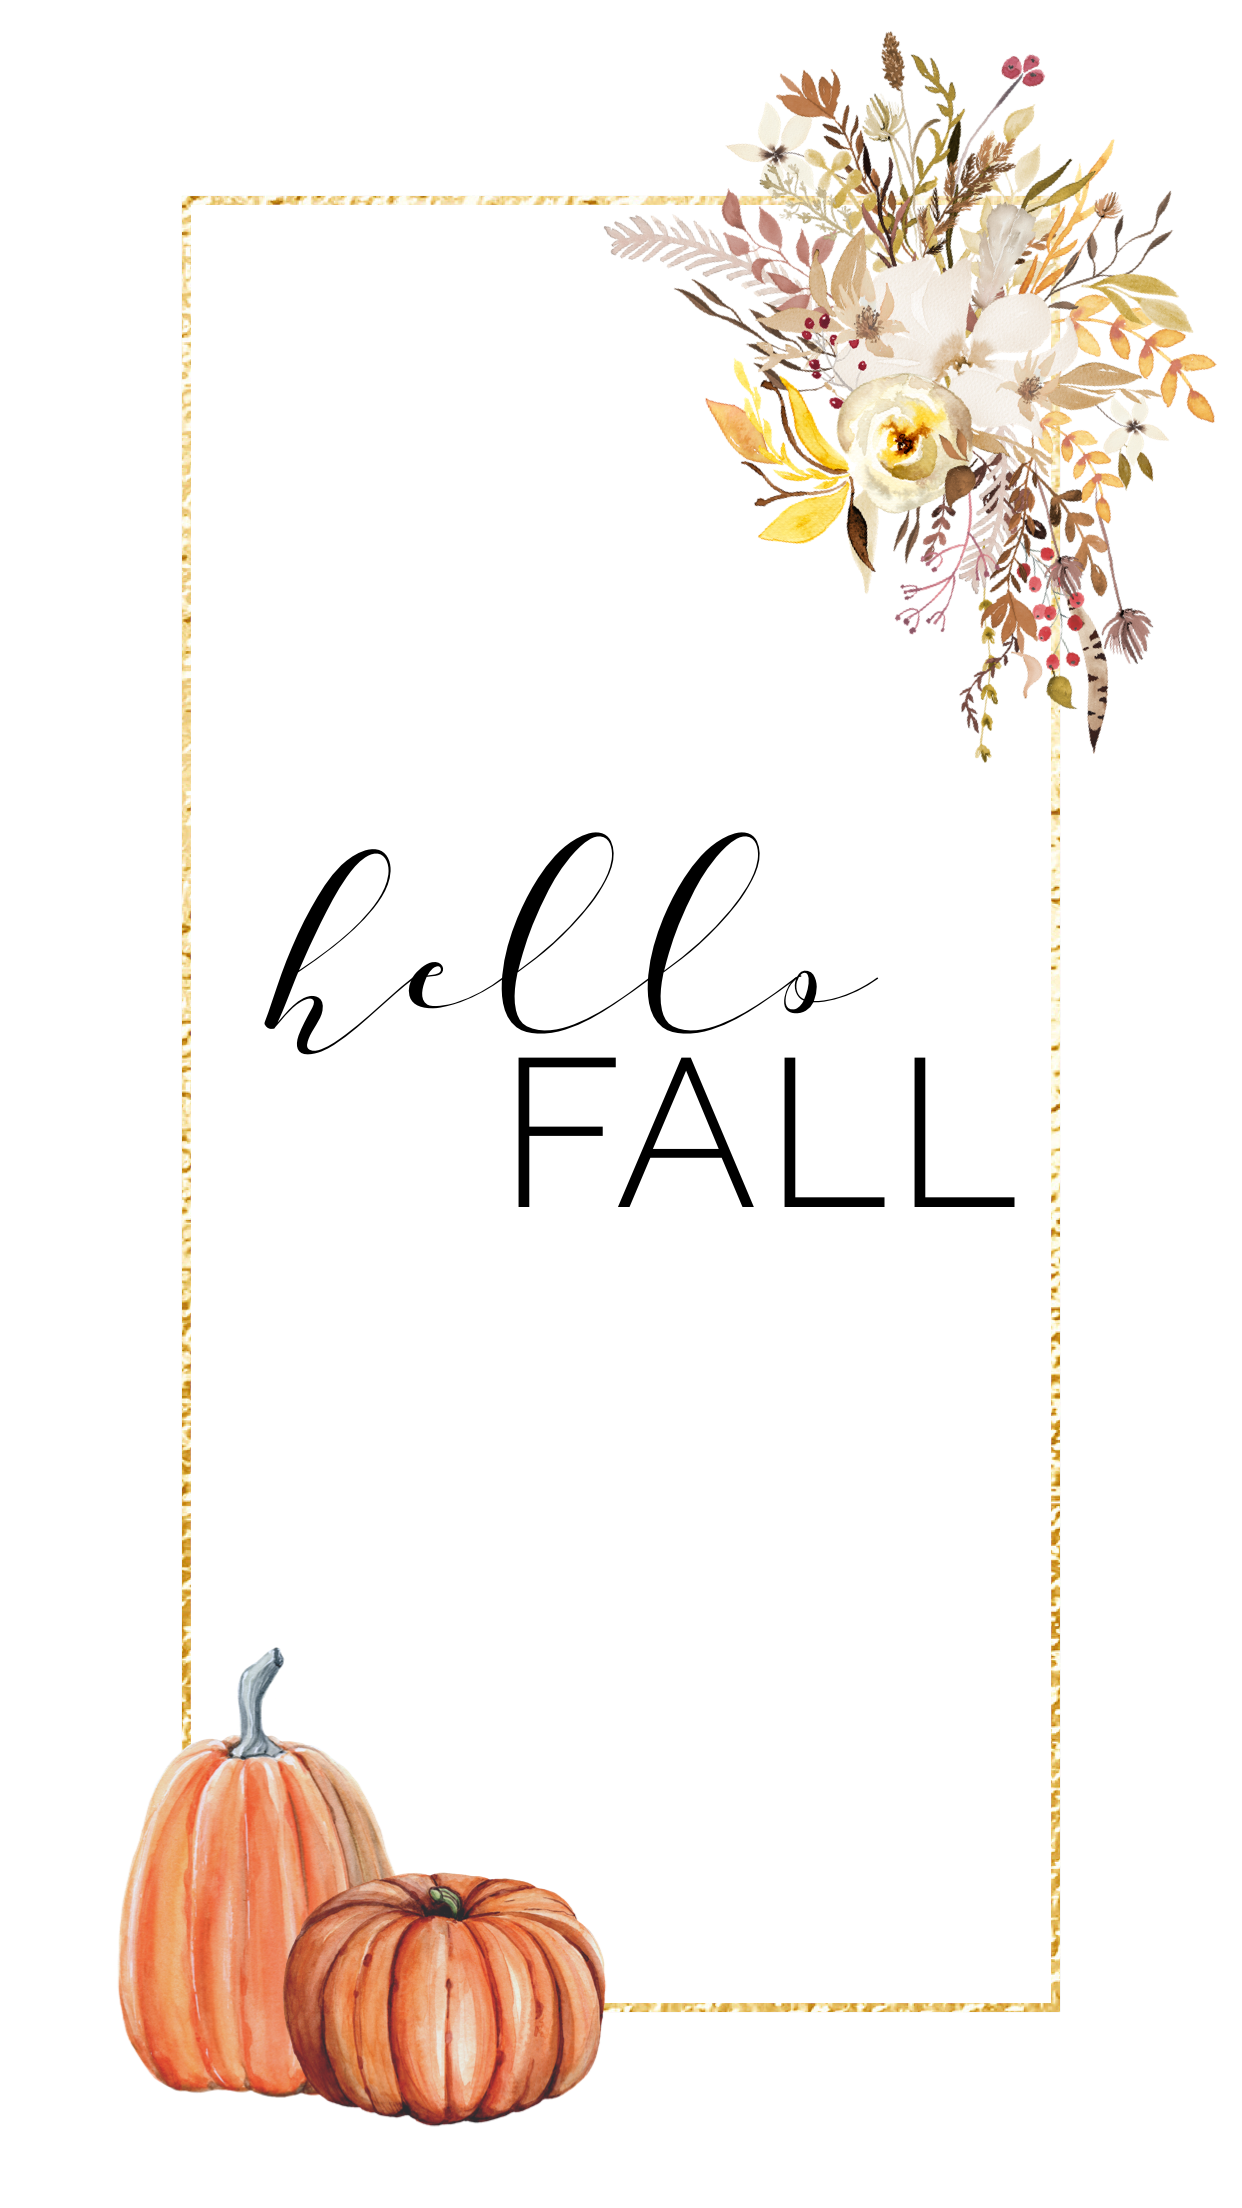 Hello Fall Fall Phone Wallpaper Pumpkin Floral Lynn Meadows Photography Pumpkin Wallpaper Iphone Wallpaper Fall Fall Wallpaper